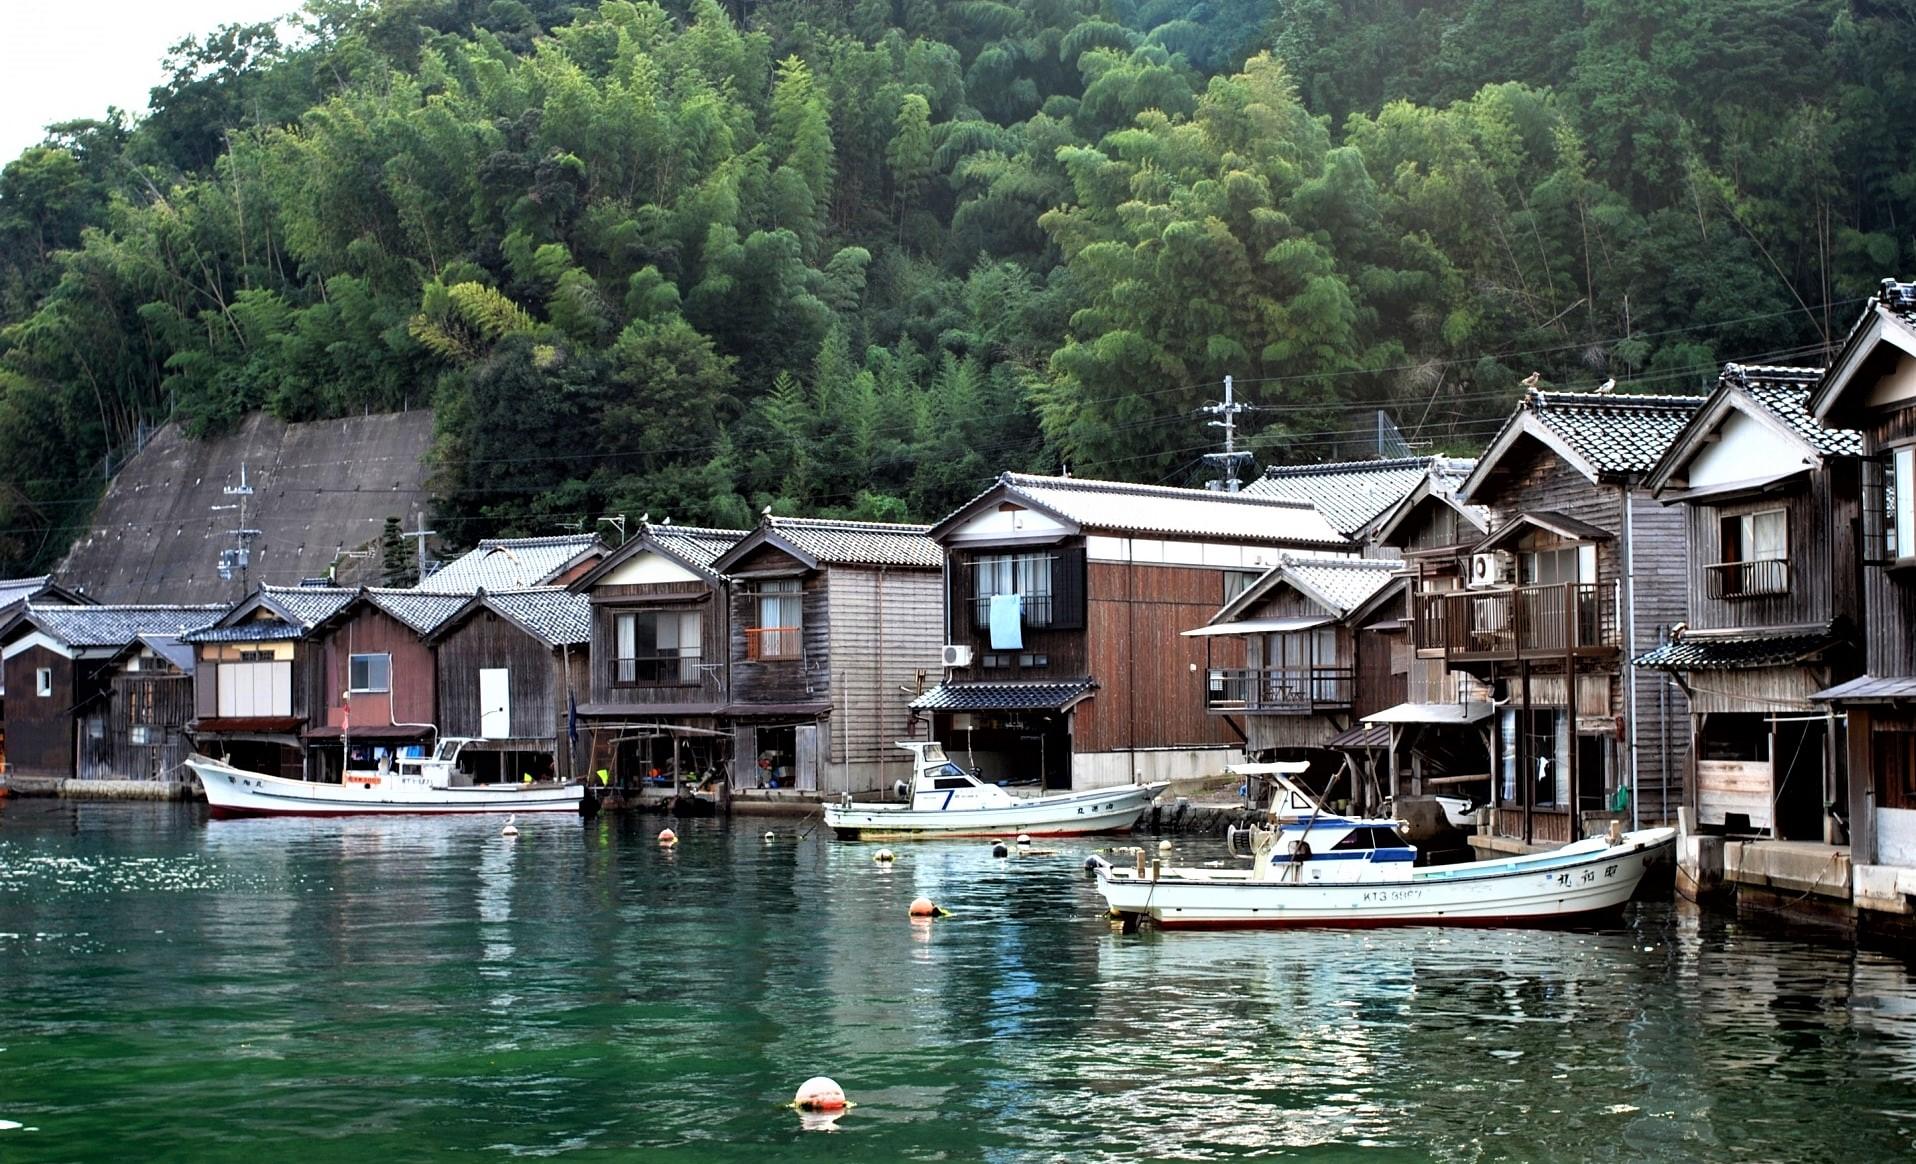 The houses of fishermen at Ine no Funaya Village